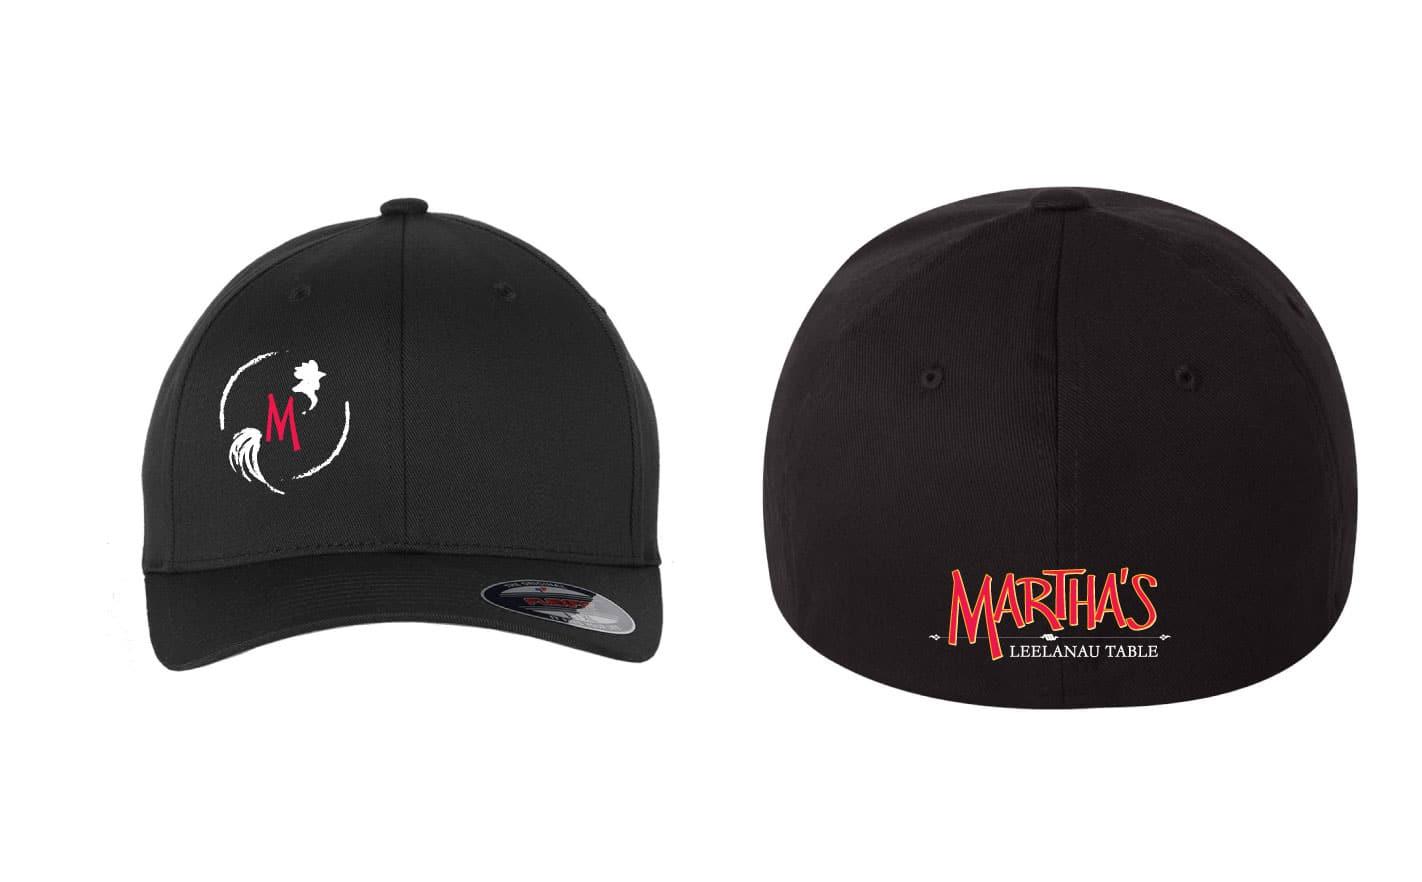 Martha's Leelanau Table Hats